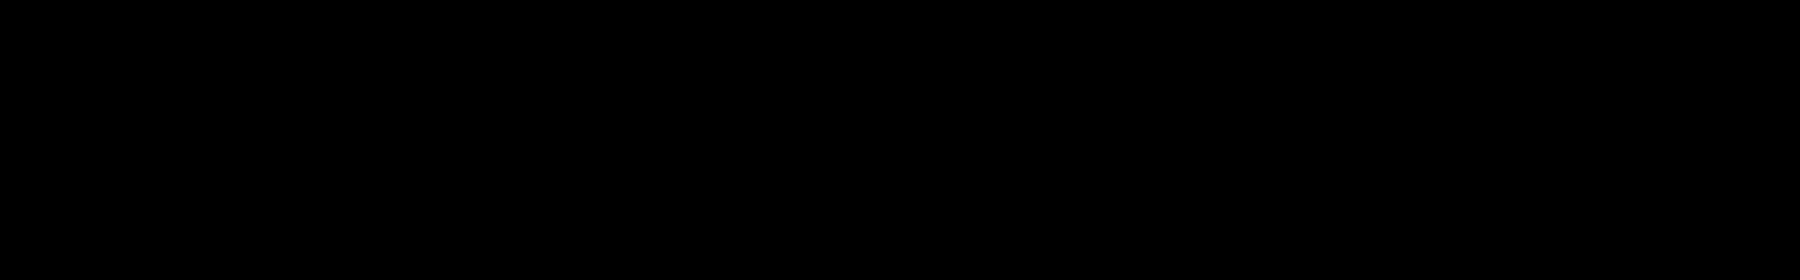 Soprano Drill audio waveform